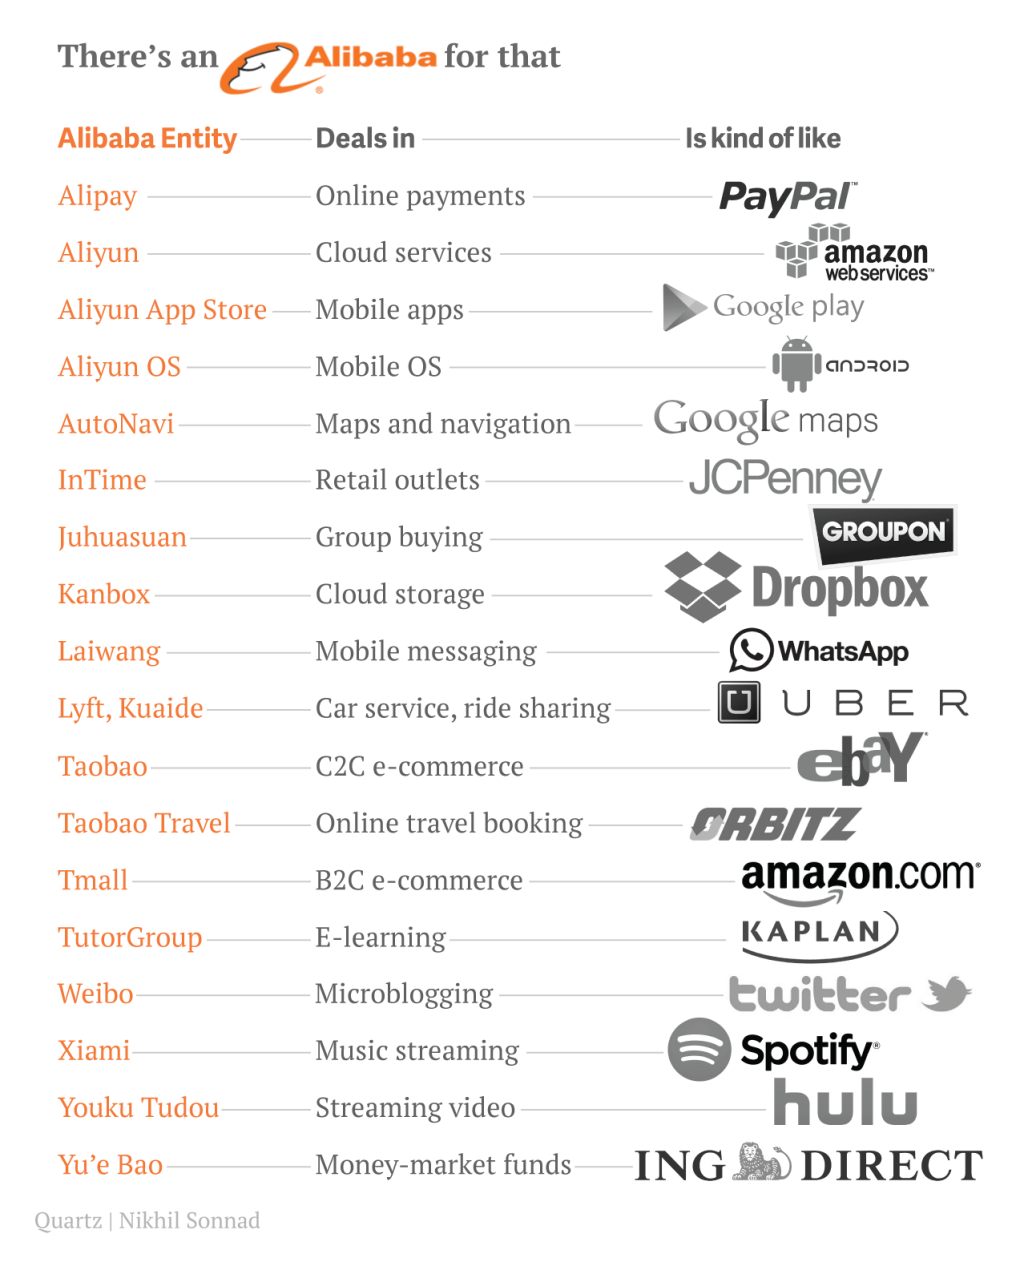 Weibo, Xiami, Taobao... : Qui sont les équivalents occidentaux de ces services d'Alibaba ?